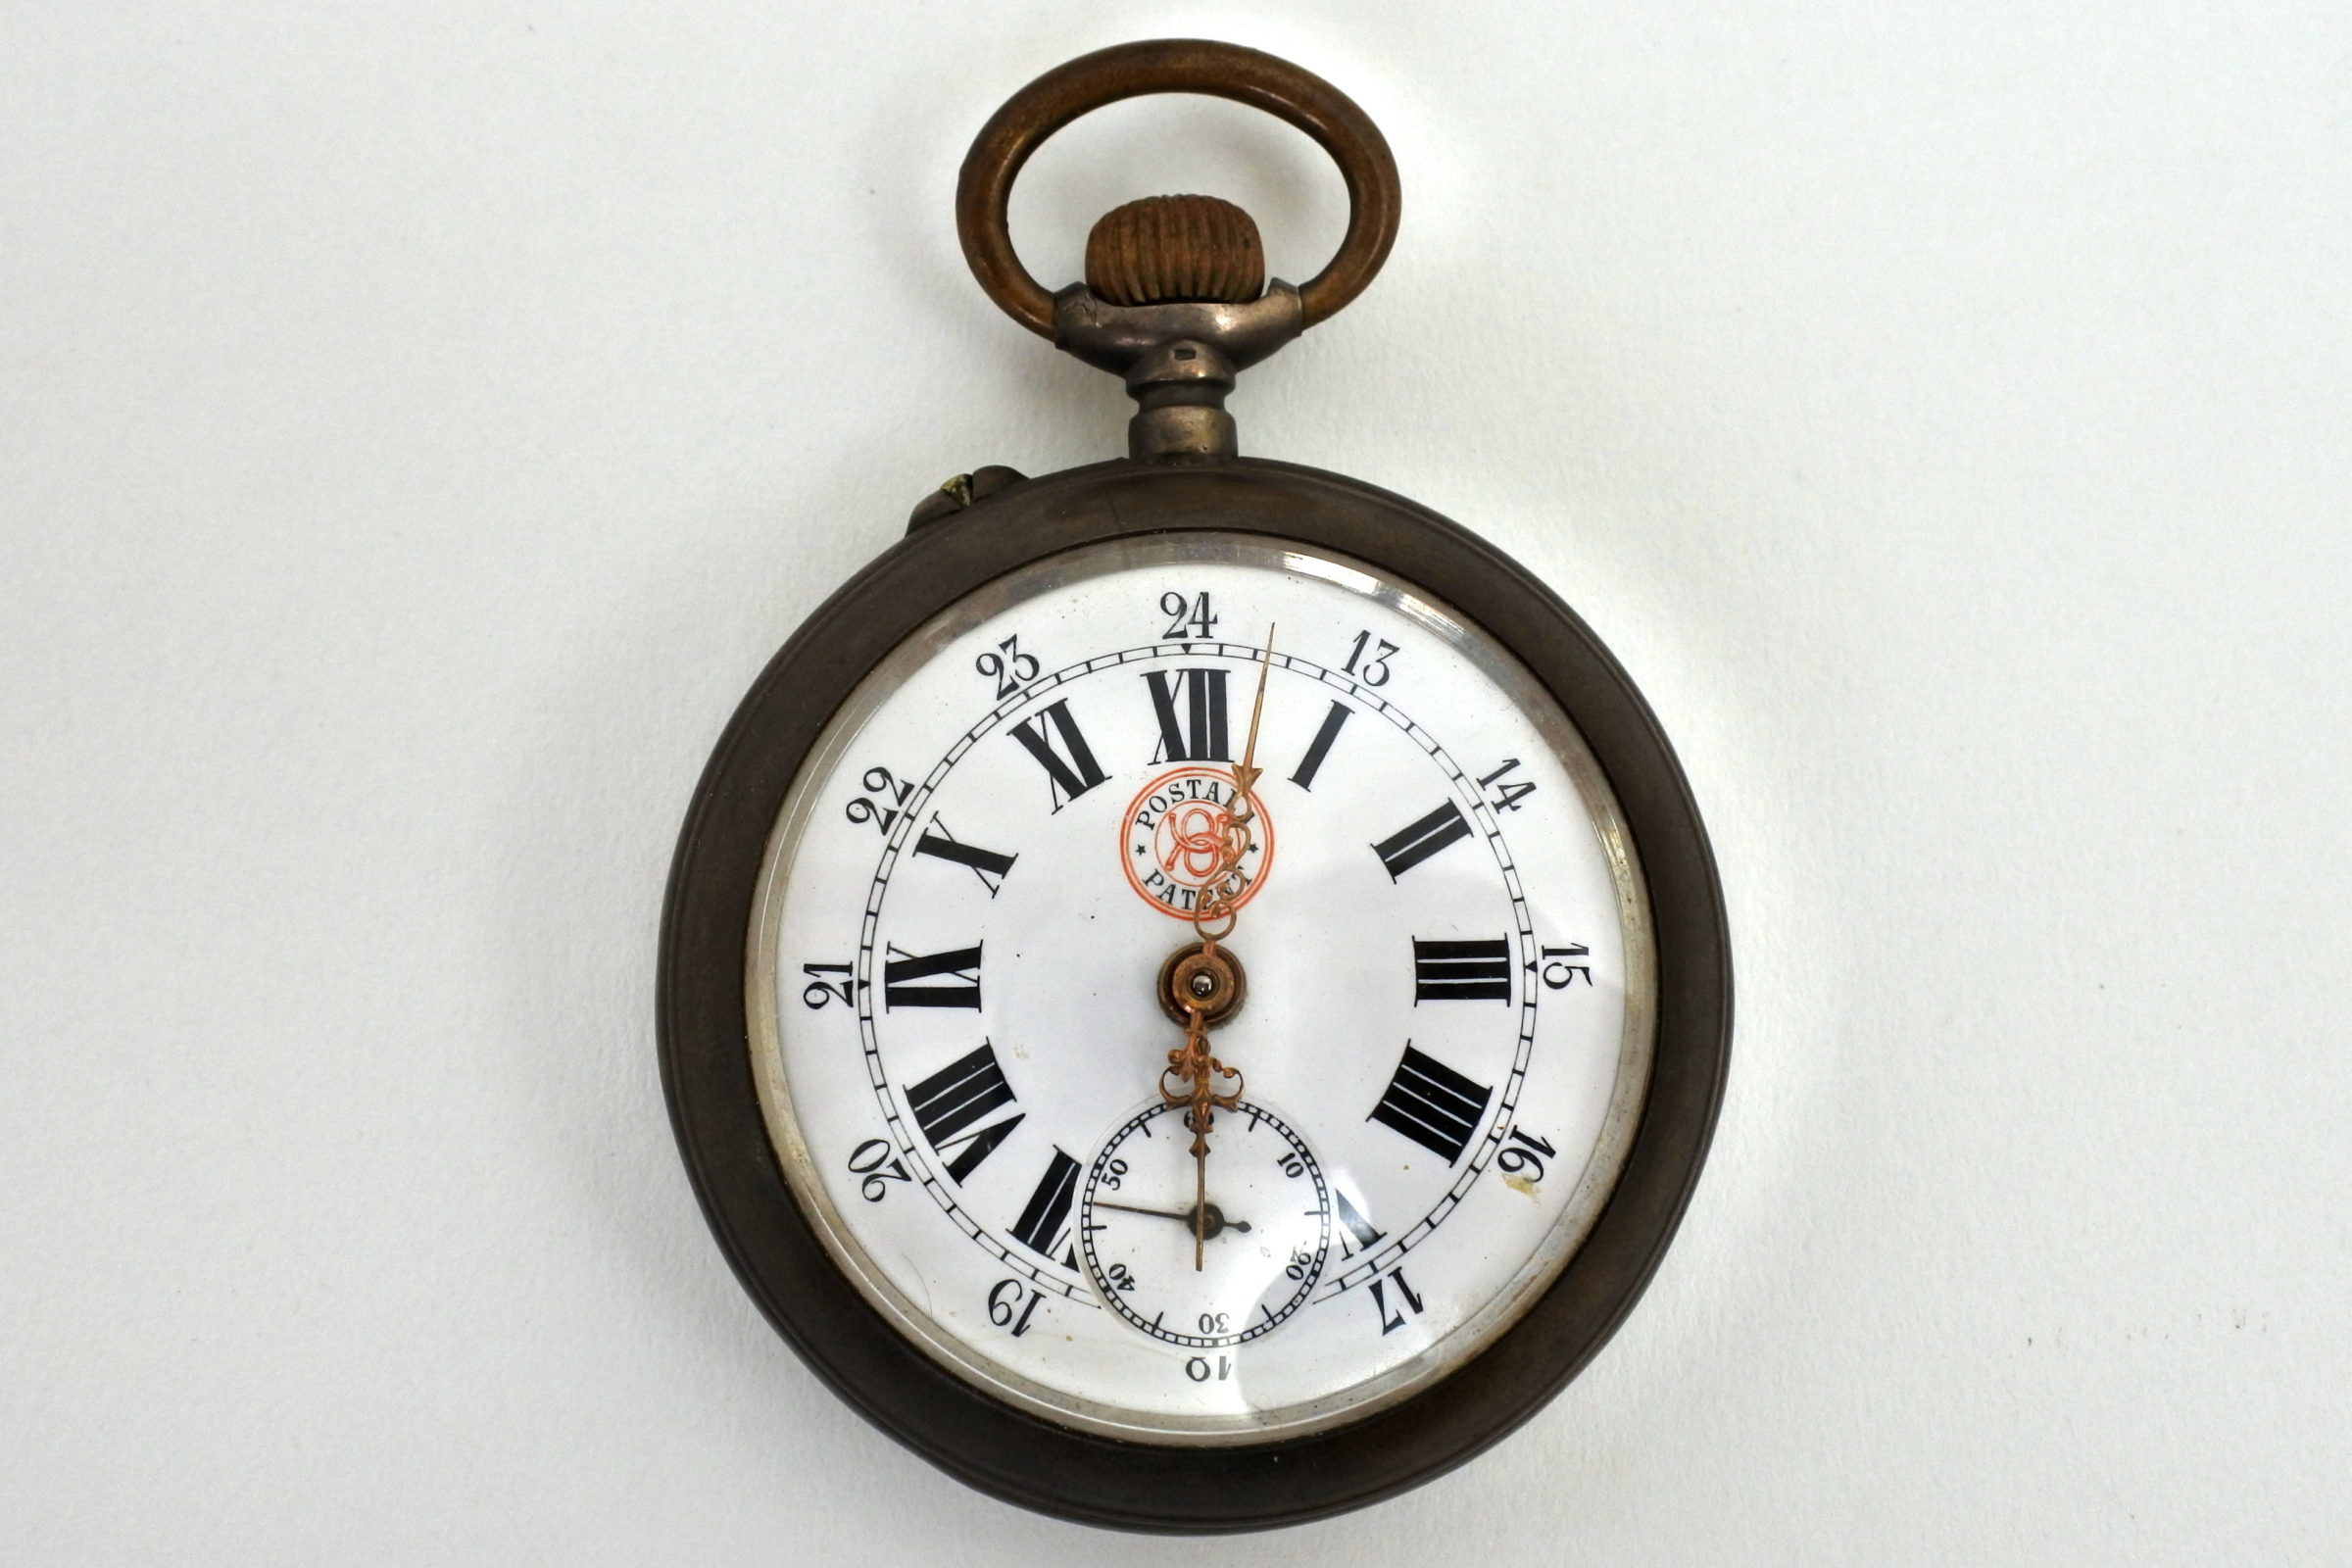 Orologio da tasca in argento – Postala patent